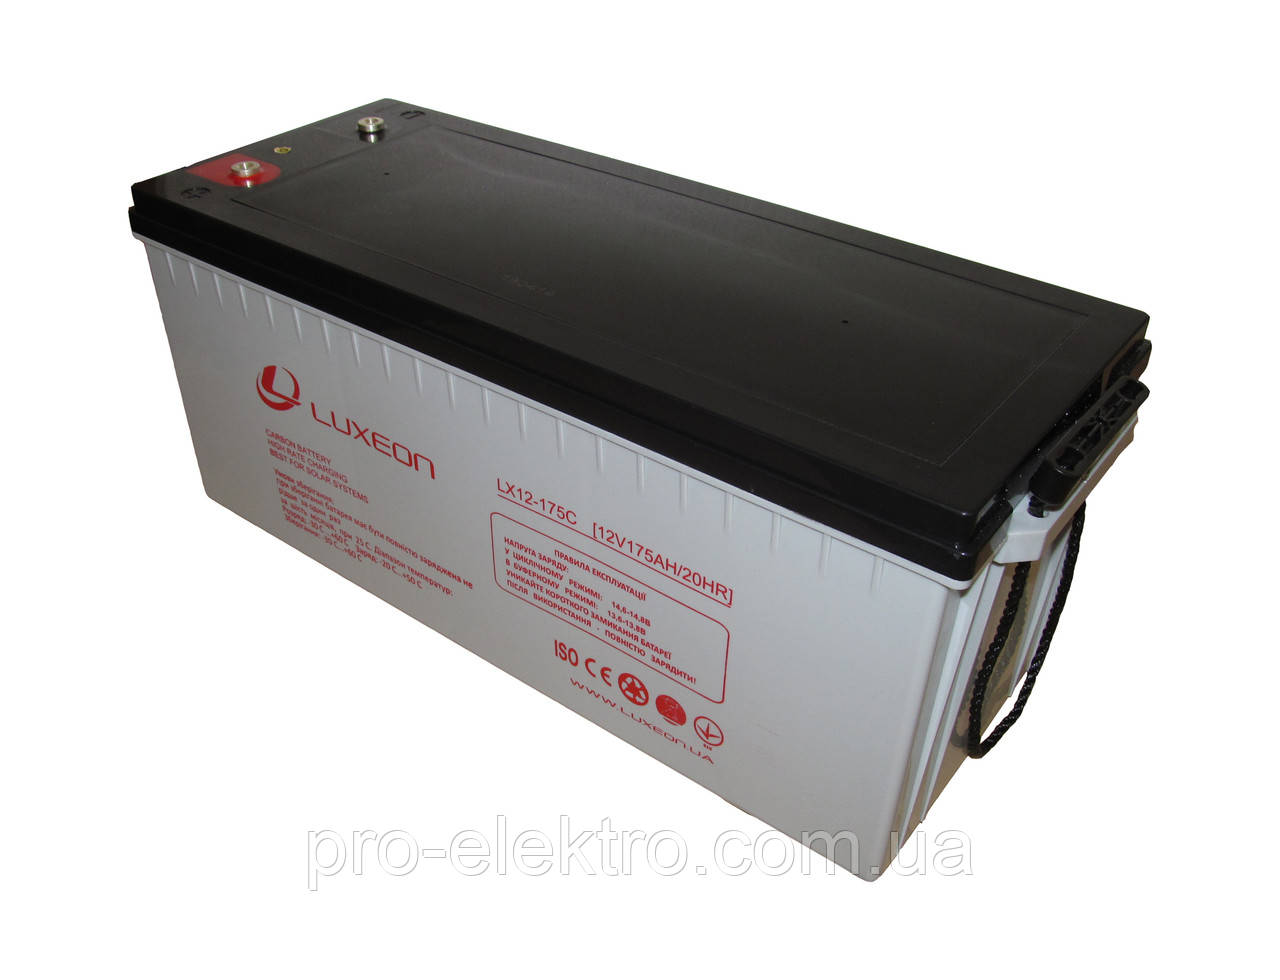 Аккумуляторная батарея LUXEON LX 12-175C